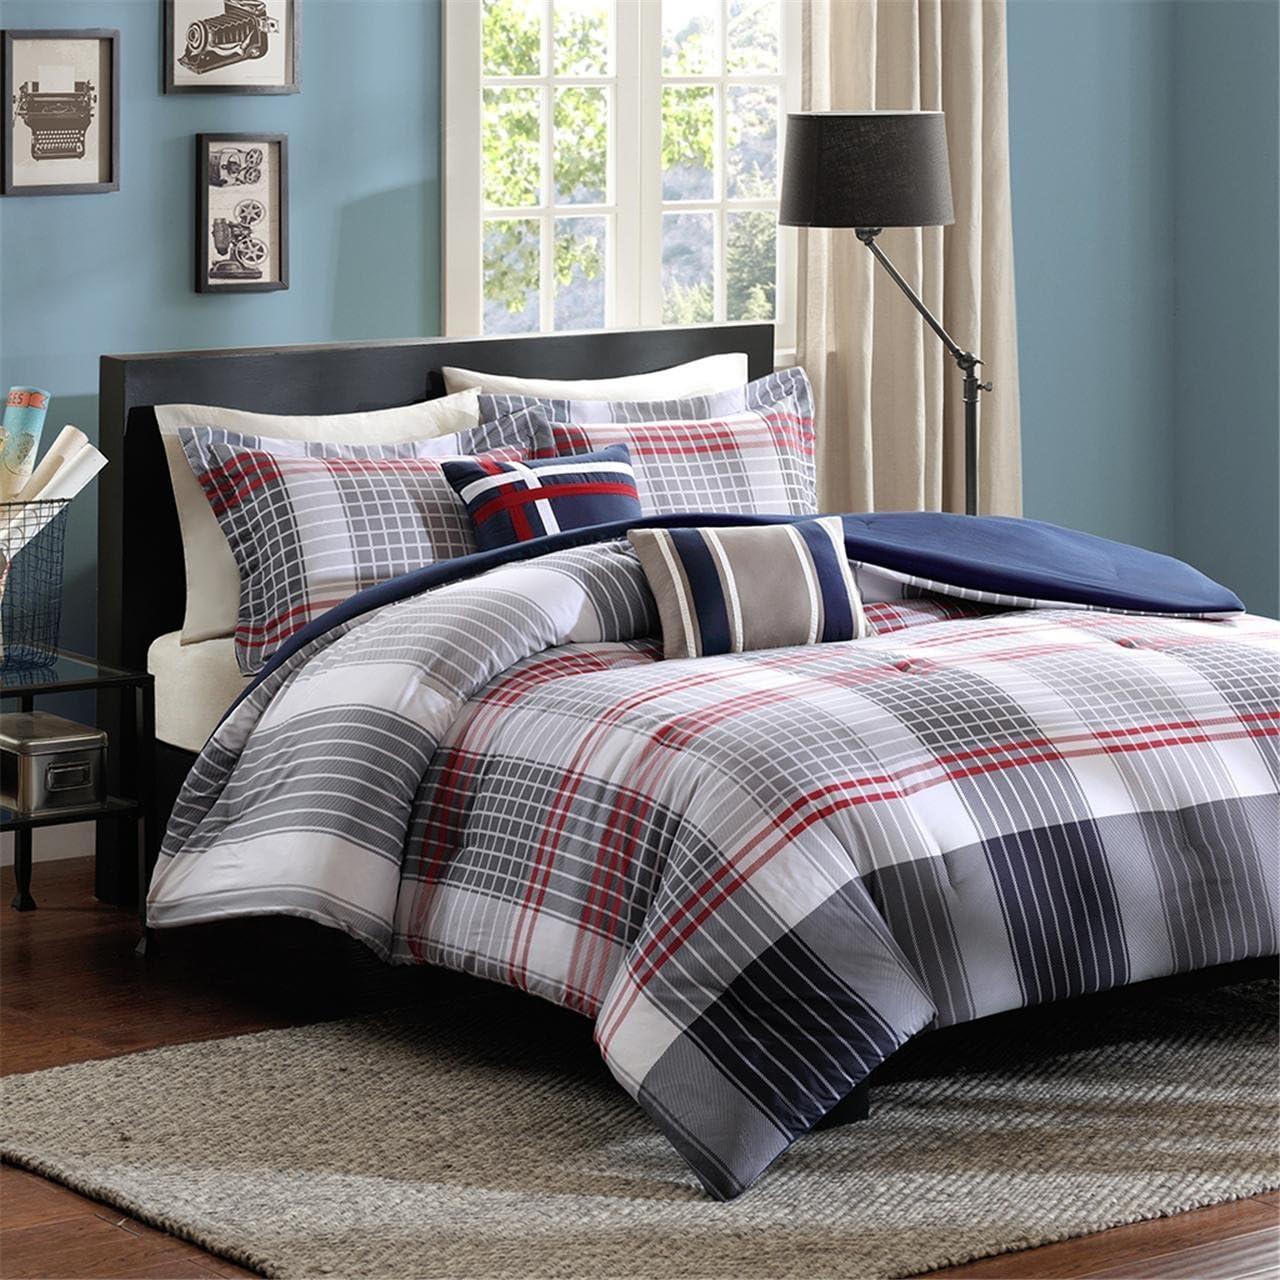 Intelligent Design Caleb 5 Piece NEW before selling trust ☆ Queen Blue Set Comforter Full